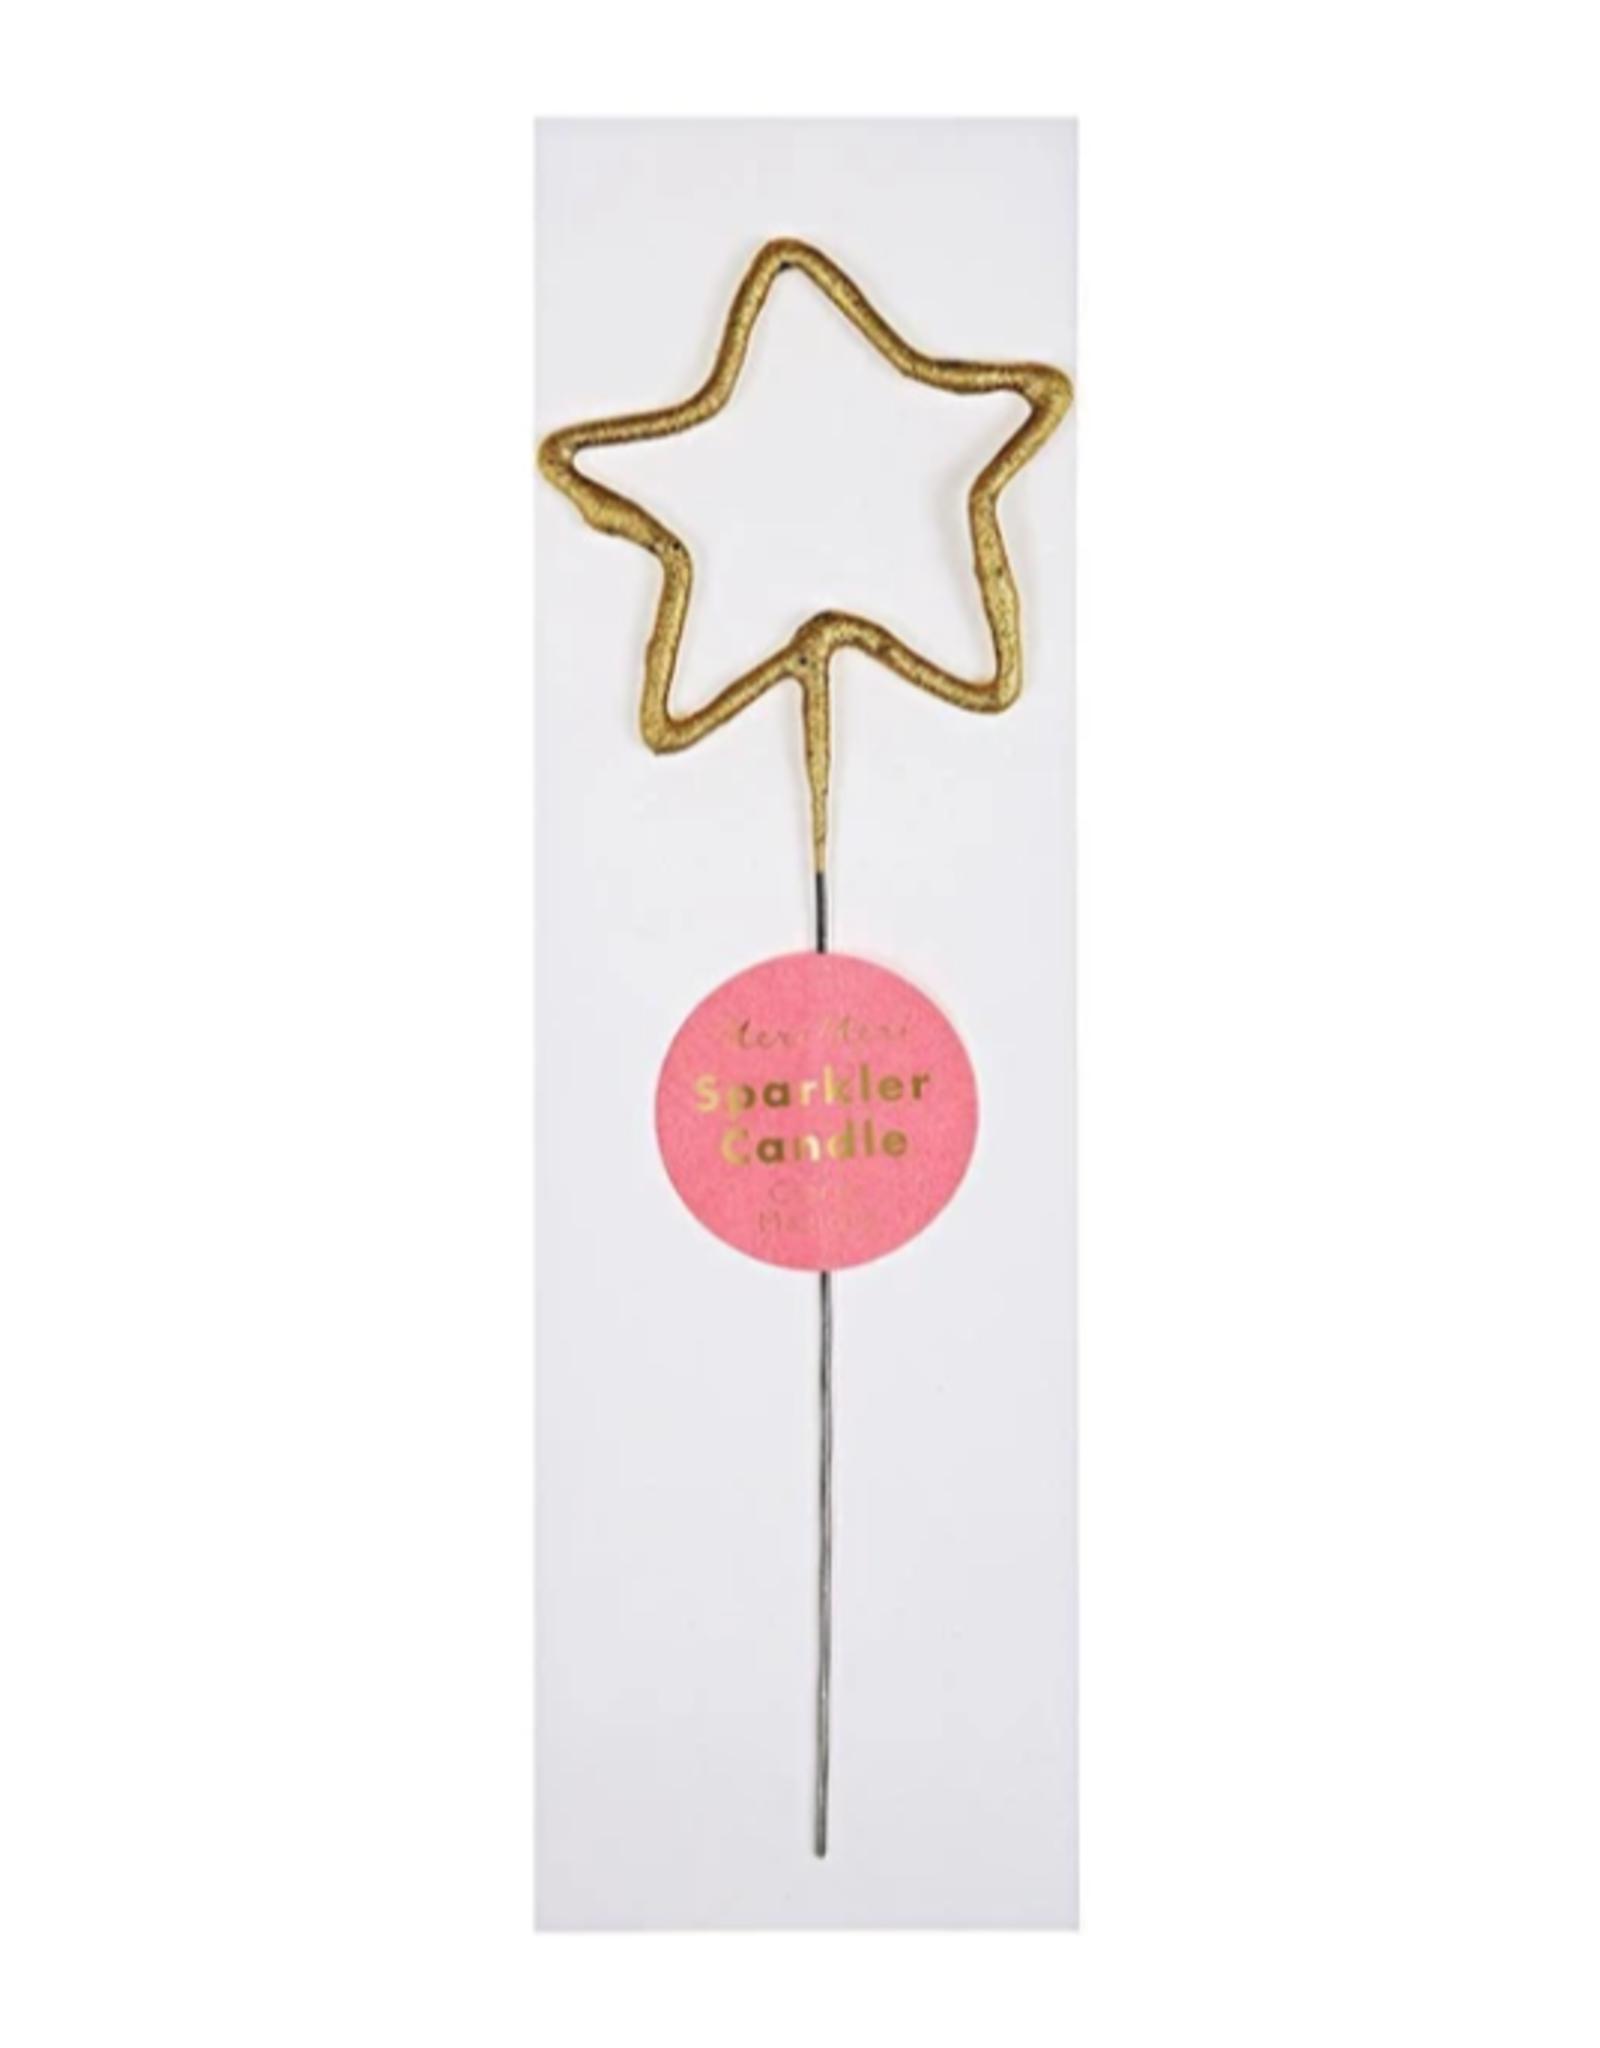 Meri Meri Candle: Gold Star Sparkler